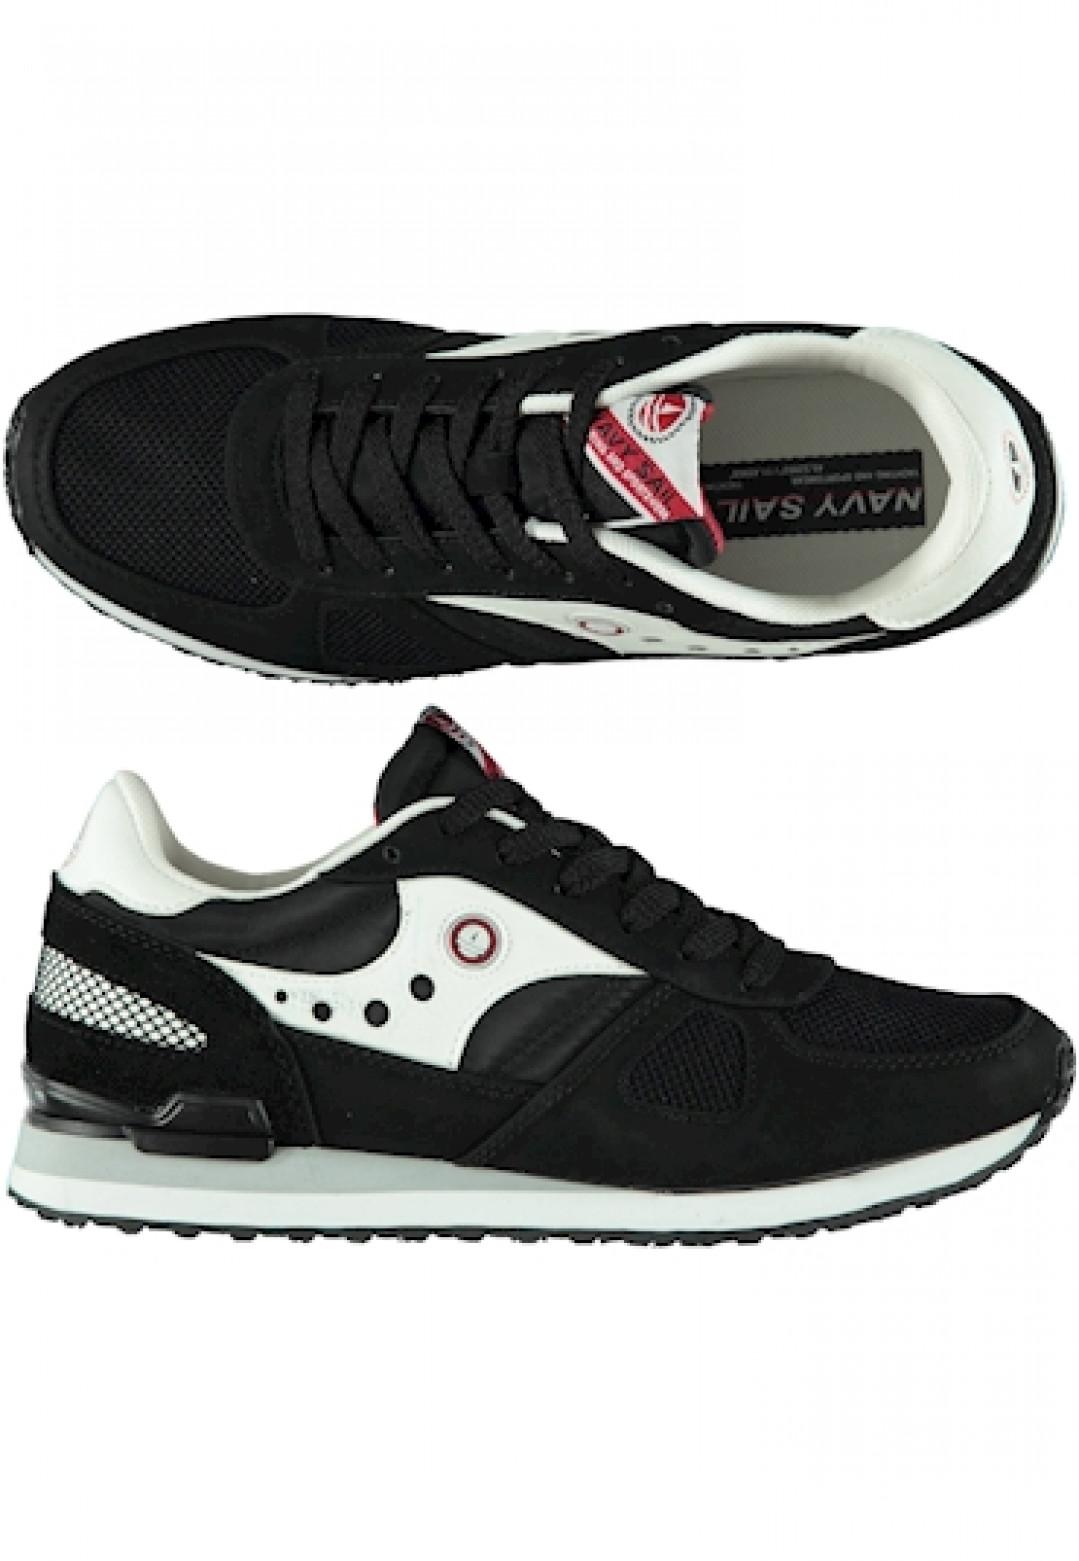 Sneakers Navy Sail 913002 53